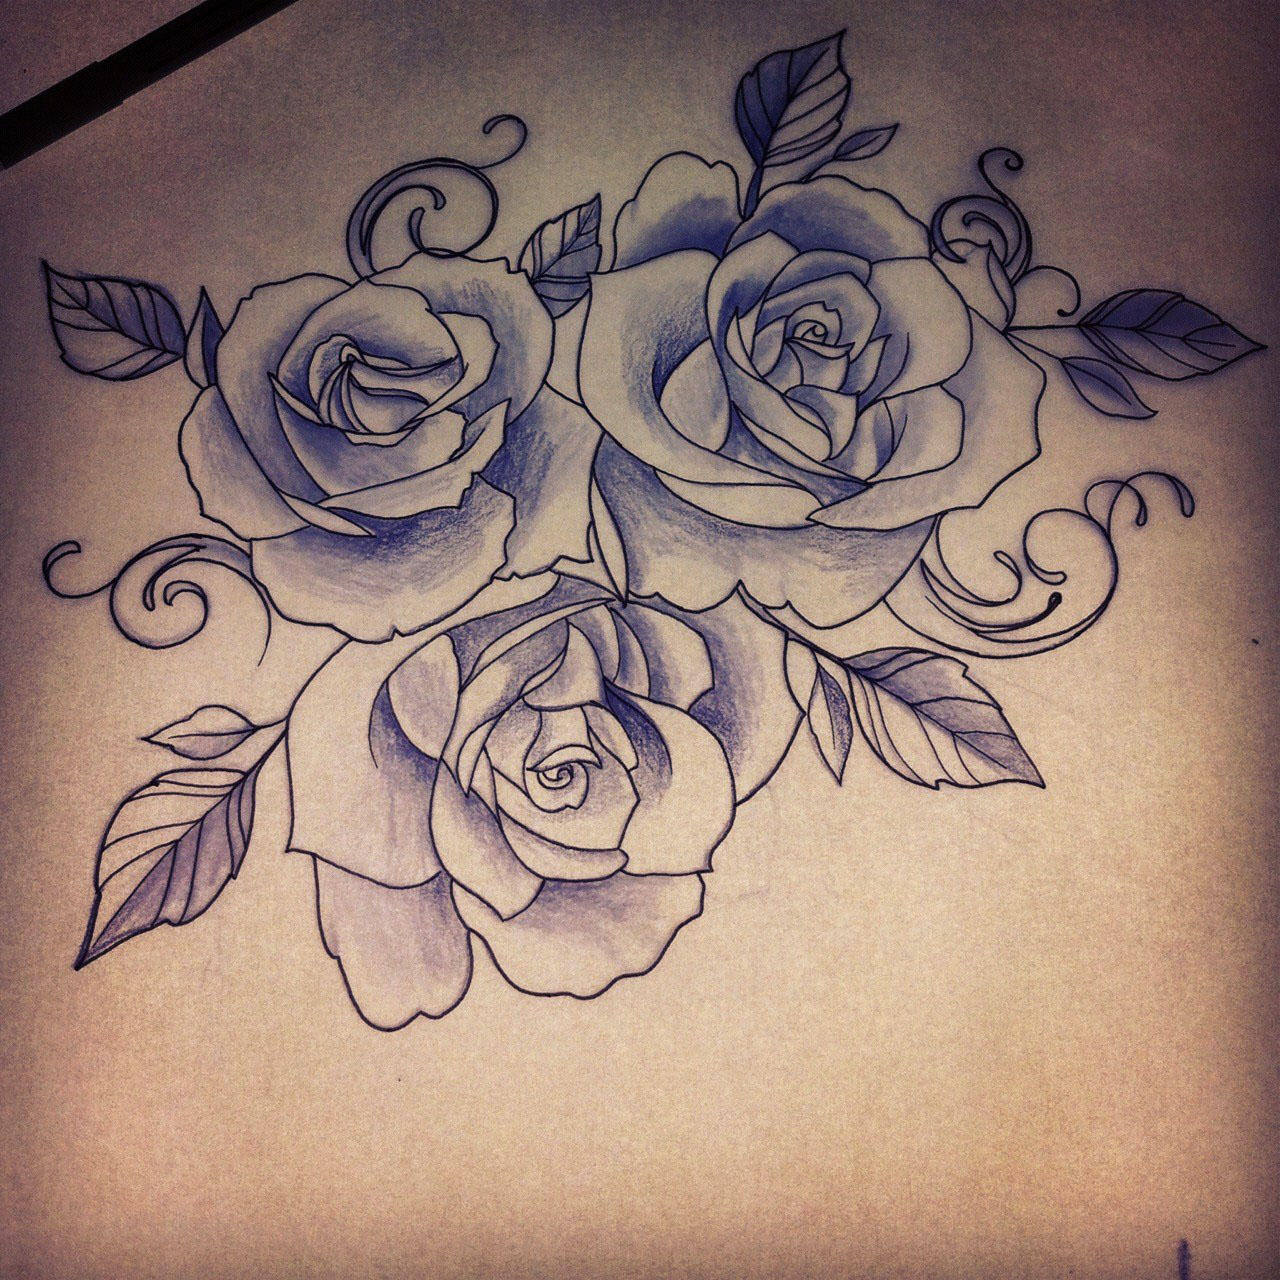 Tattoo Design Gallery 360: Rose Drawing Tattoo